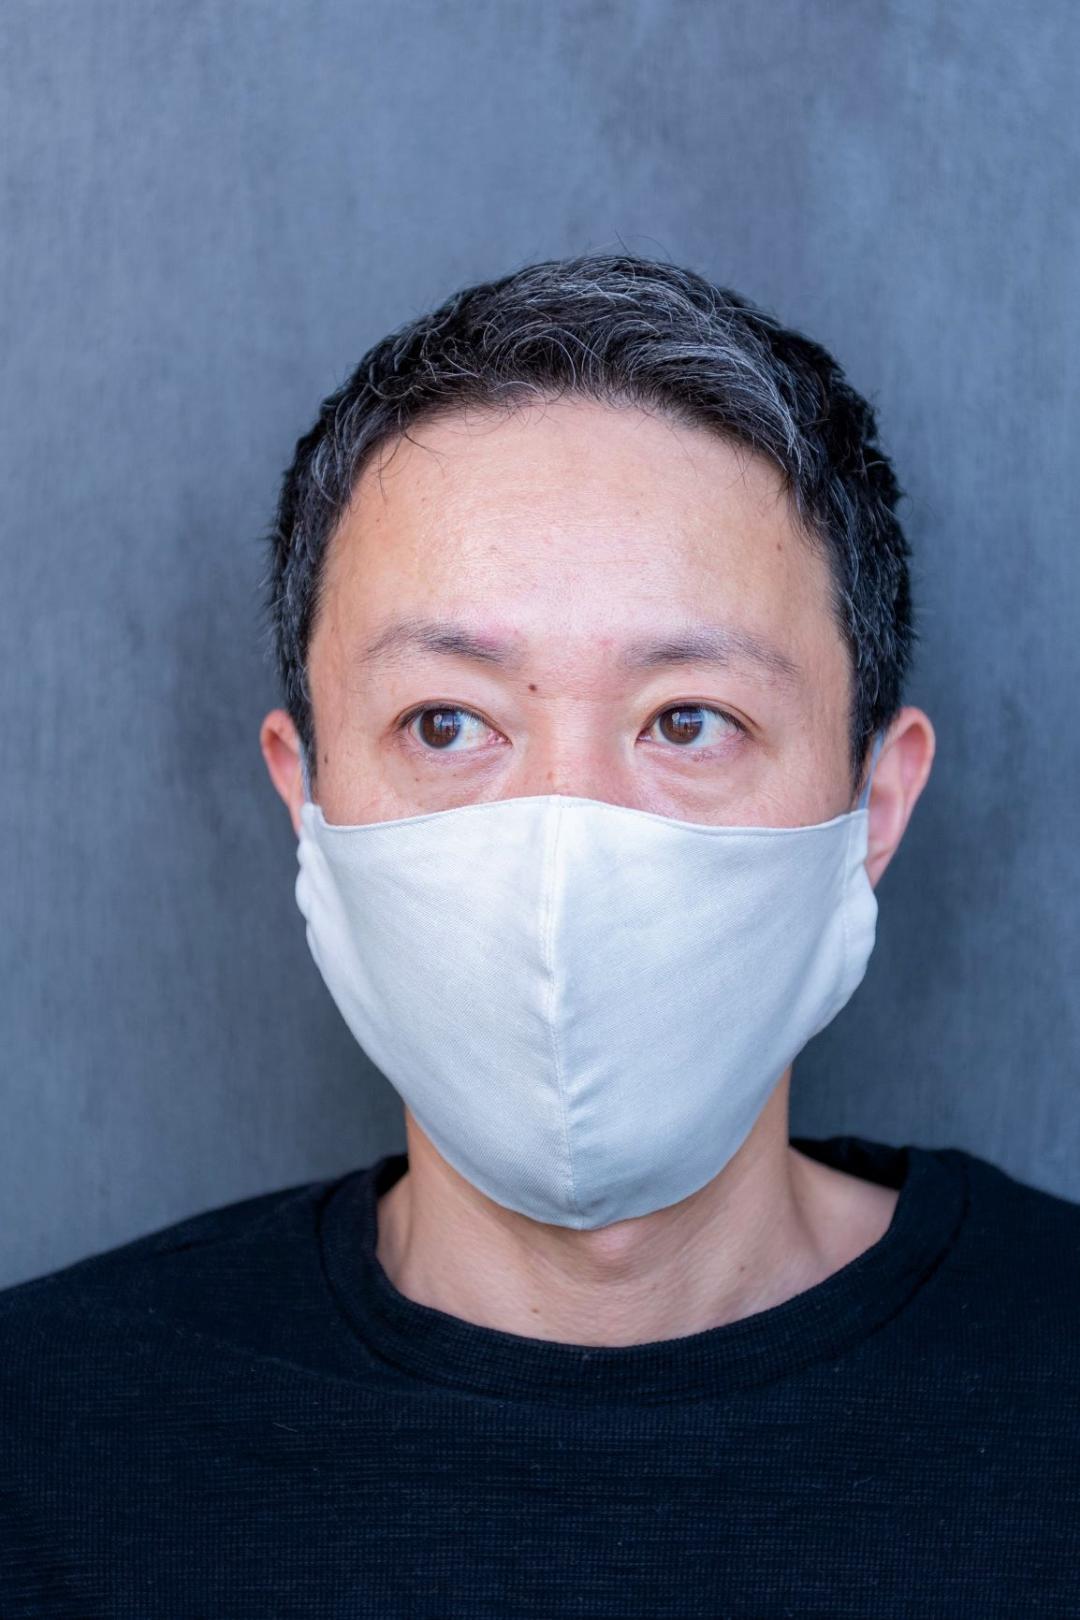 【Lサイズ】国産ダブルガーゼ不織布フィルターポケット付き立体マスク(ノーズワイヤーなし)アイスグレー画像